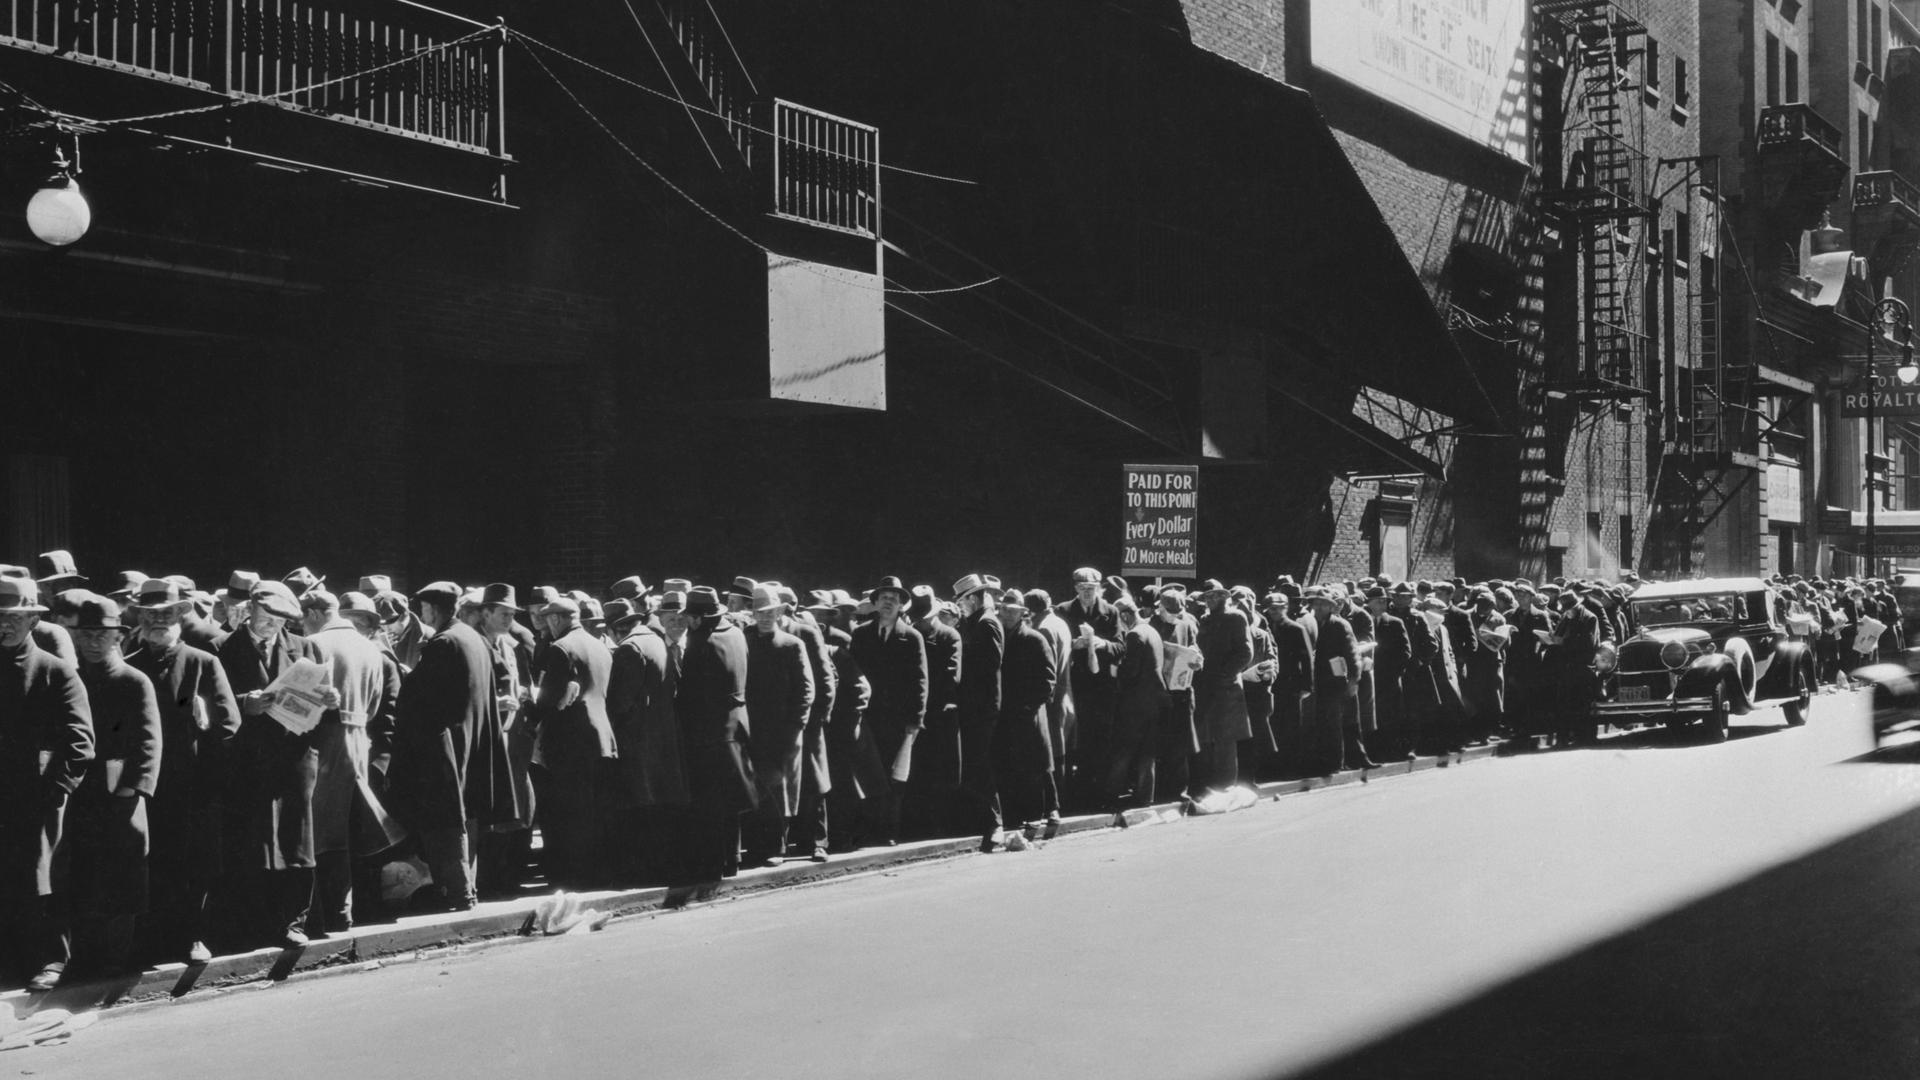 Crise de 1929 - fila de comida